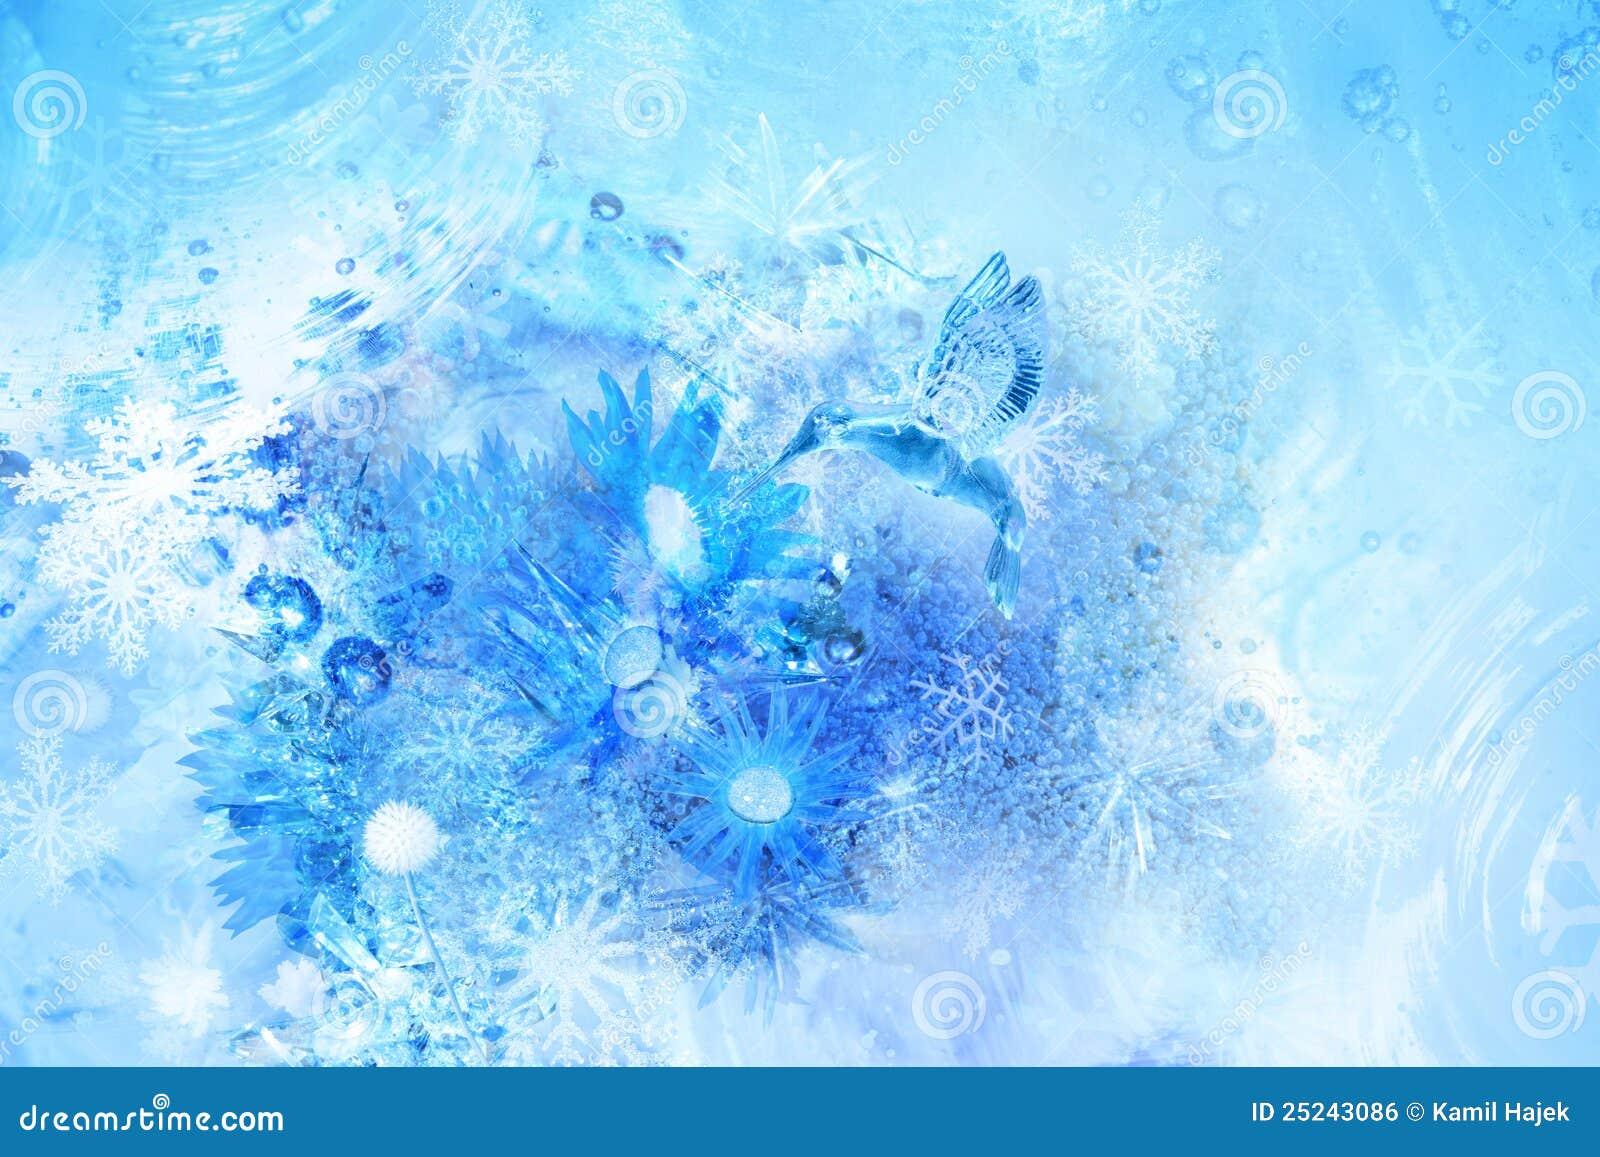 Ice Dreams Scene 6